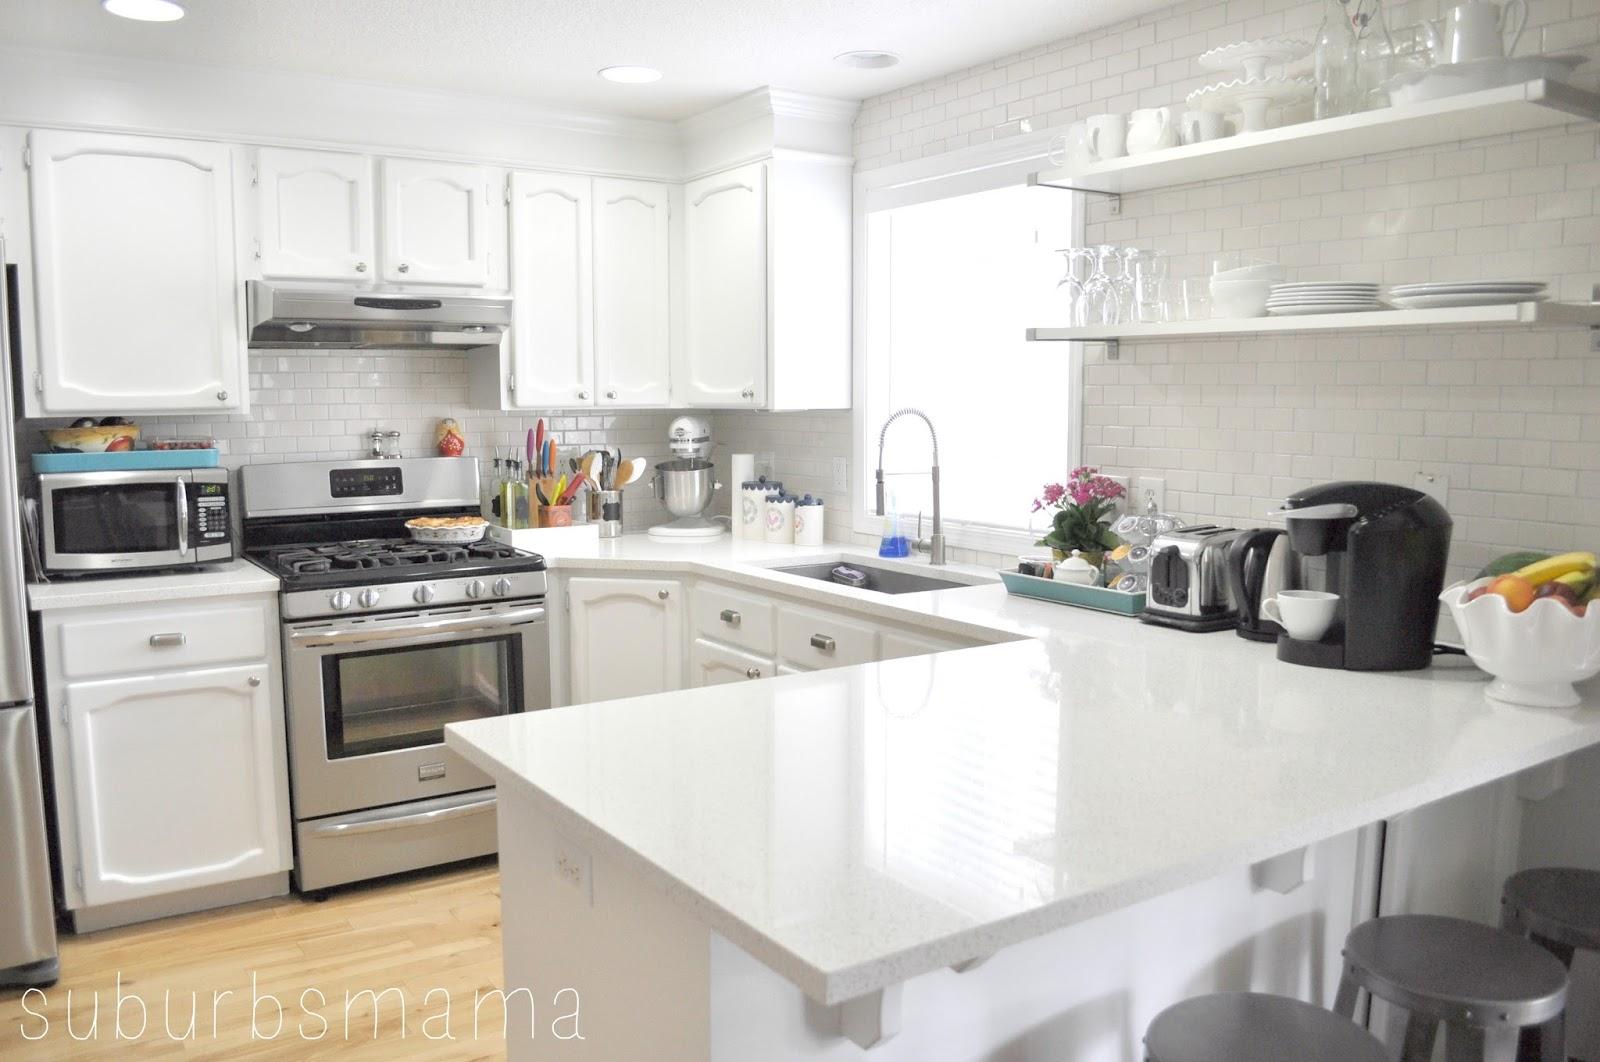 Suburbs Mama: My Kitchen - New Counters!